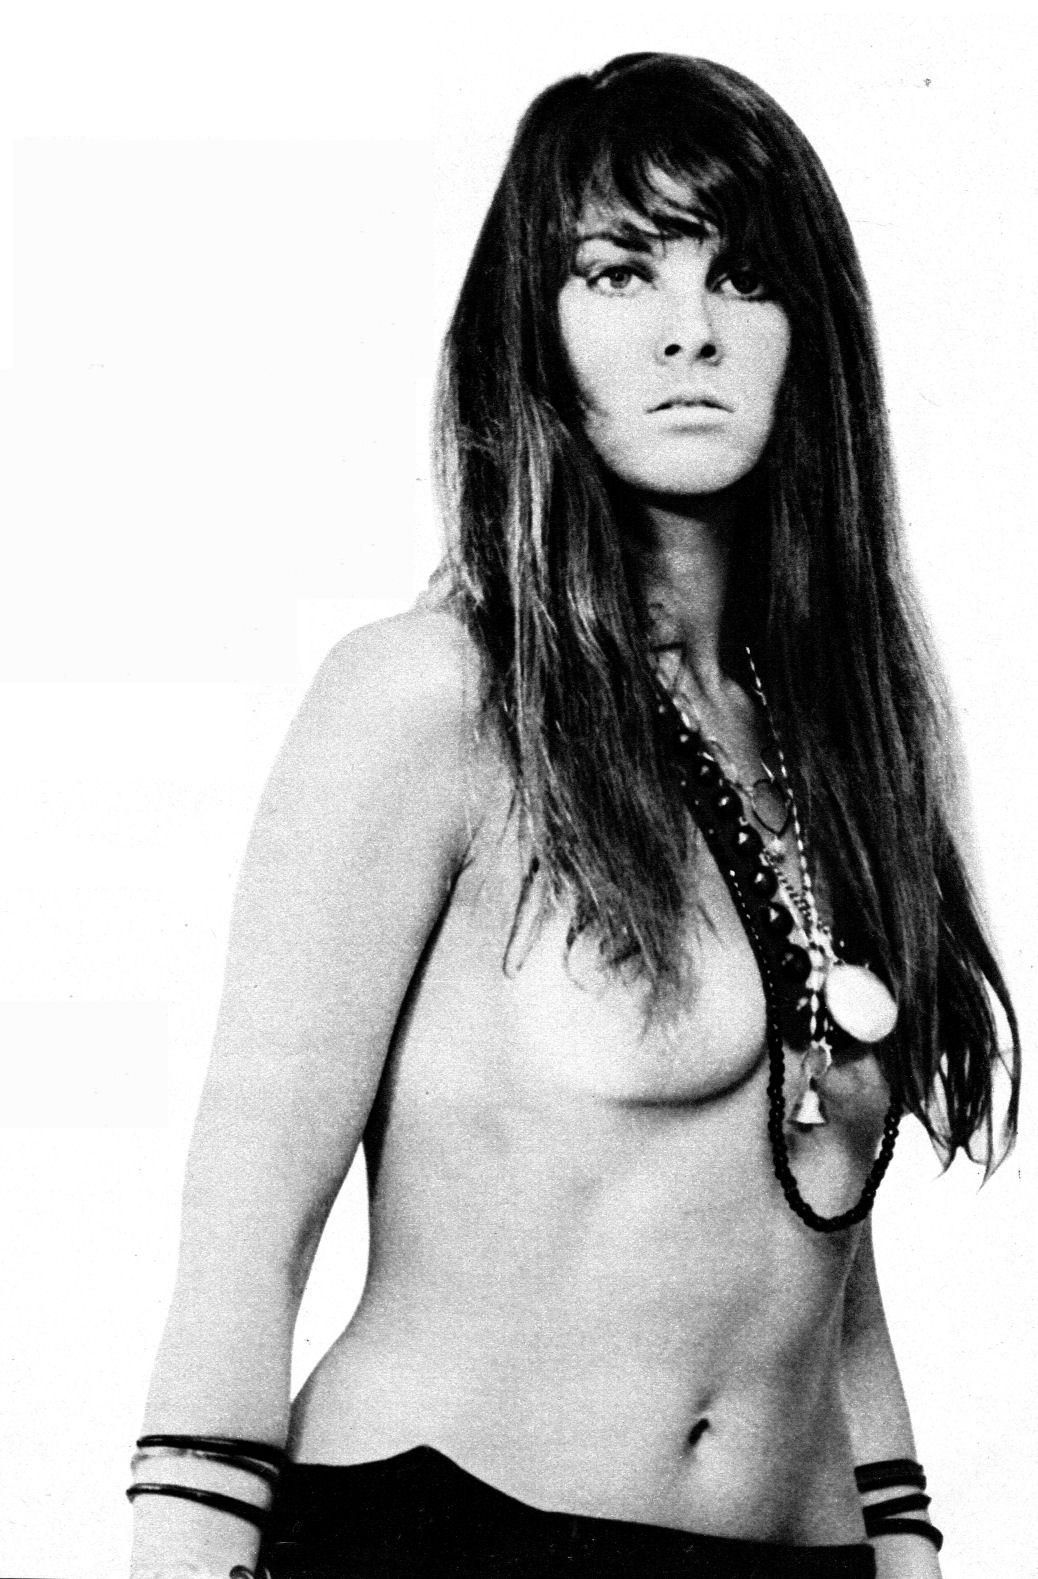 Caroline munro topless bikini — pic 12